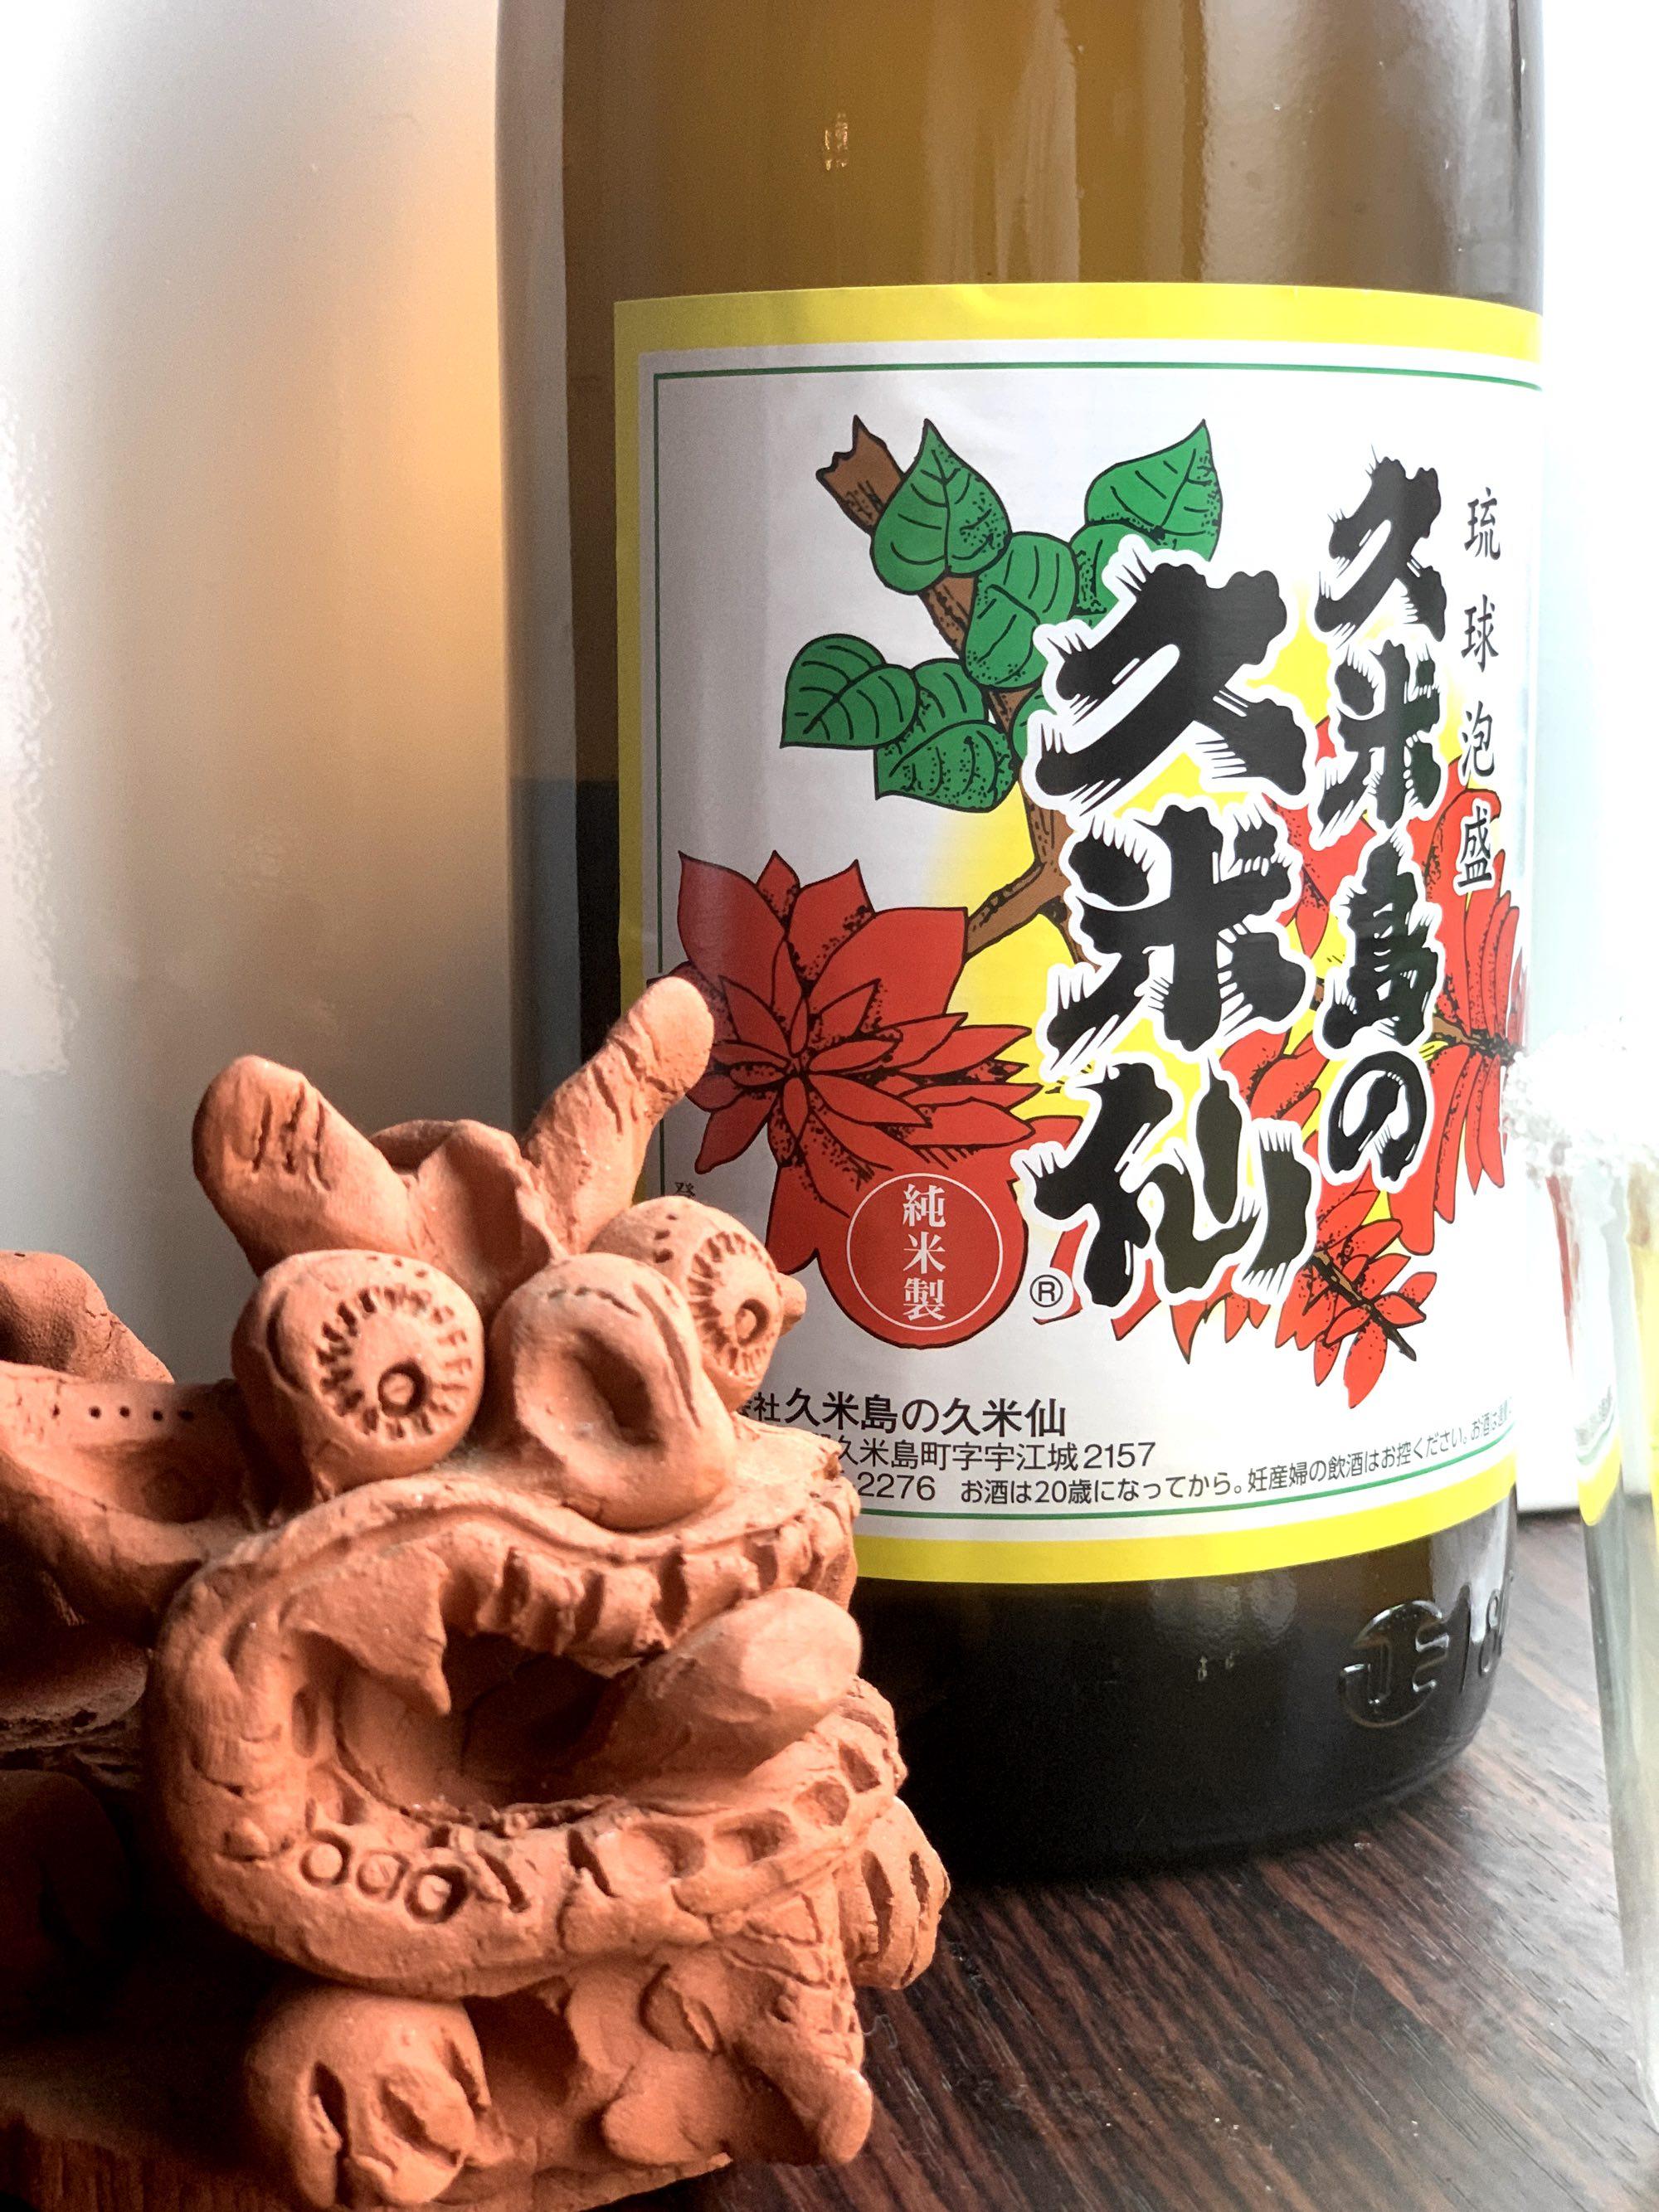 OkinawanPalomaLeadSavvySips2 Japanese Cocktail